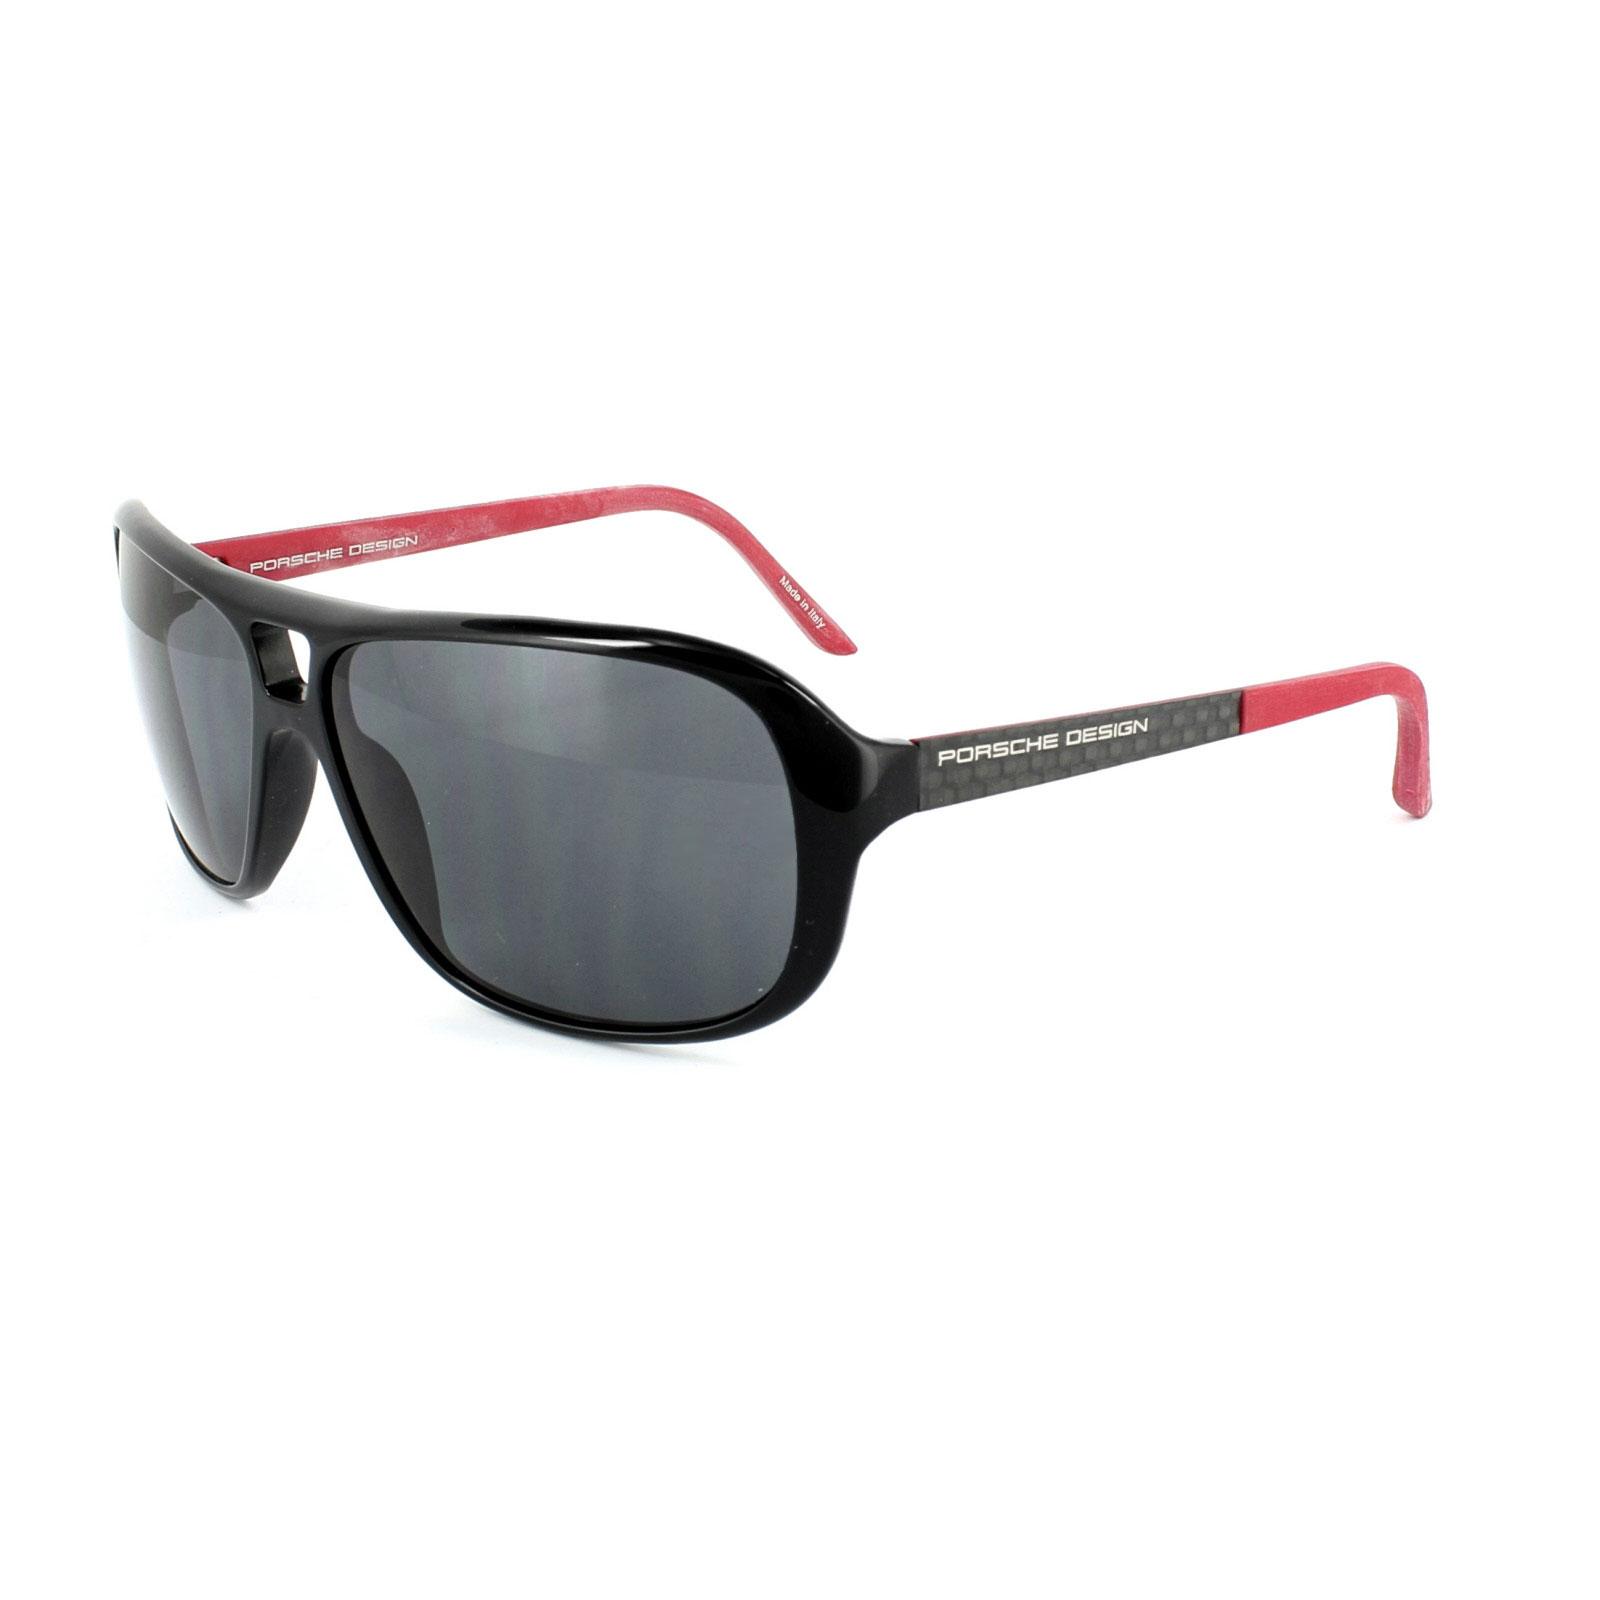 Cheap Porsche Design P8557 Sunglasses Discounted Sunglasses